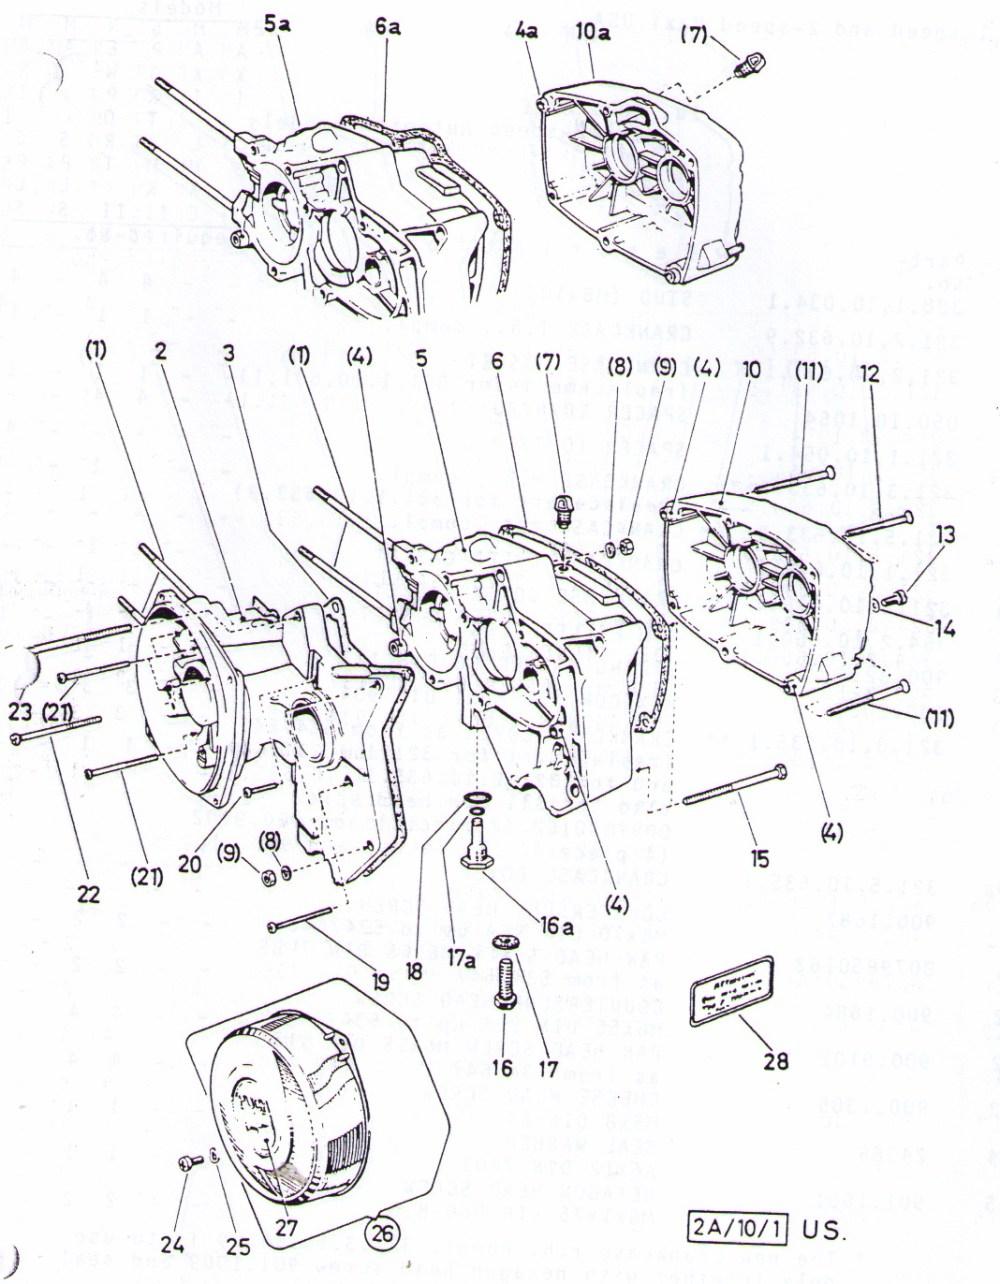 medium resolution of puch wiring diagram puch image wiring diagram puch moped wiring diagram puch auto wiring diagram schematic